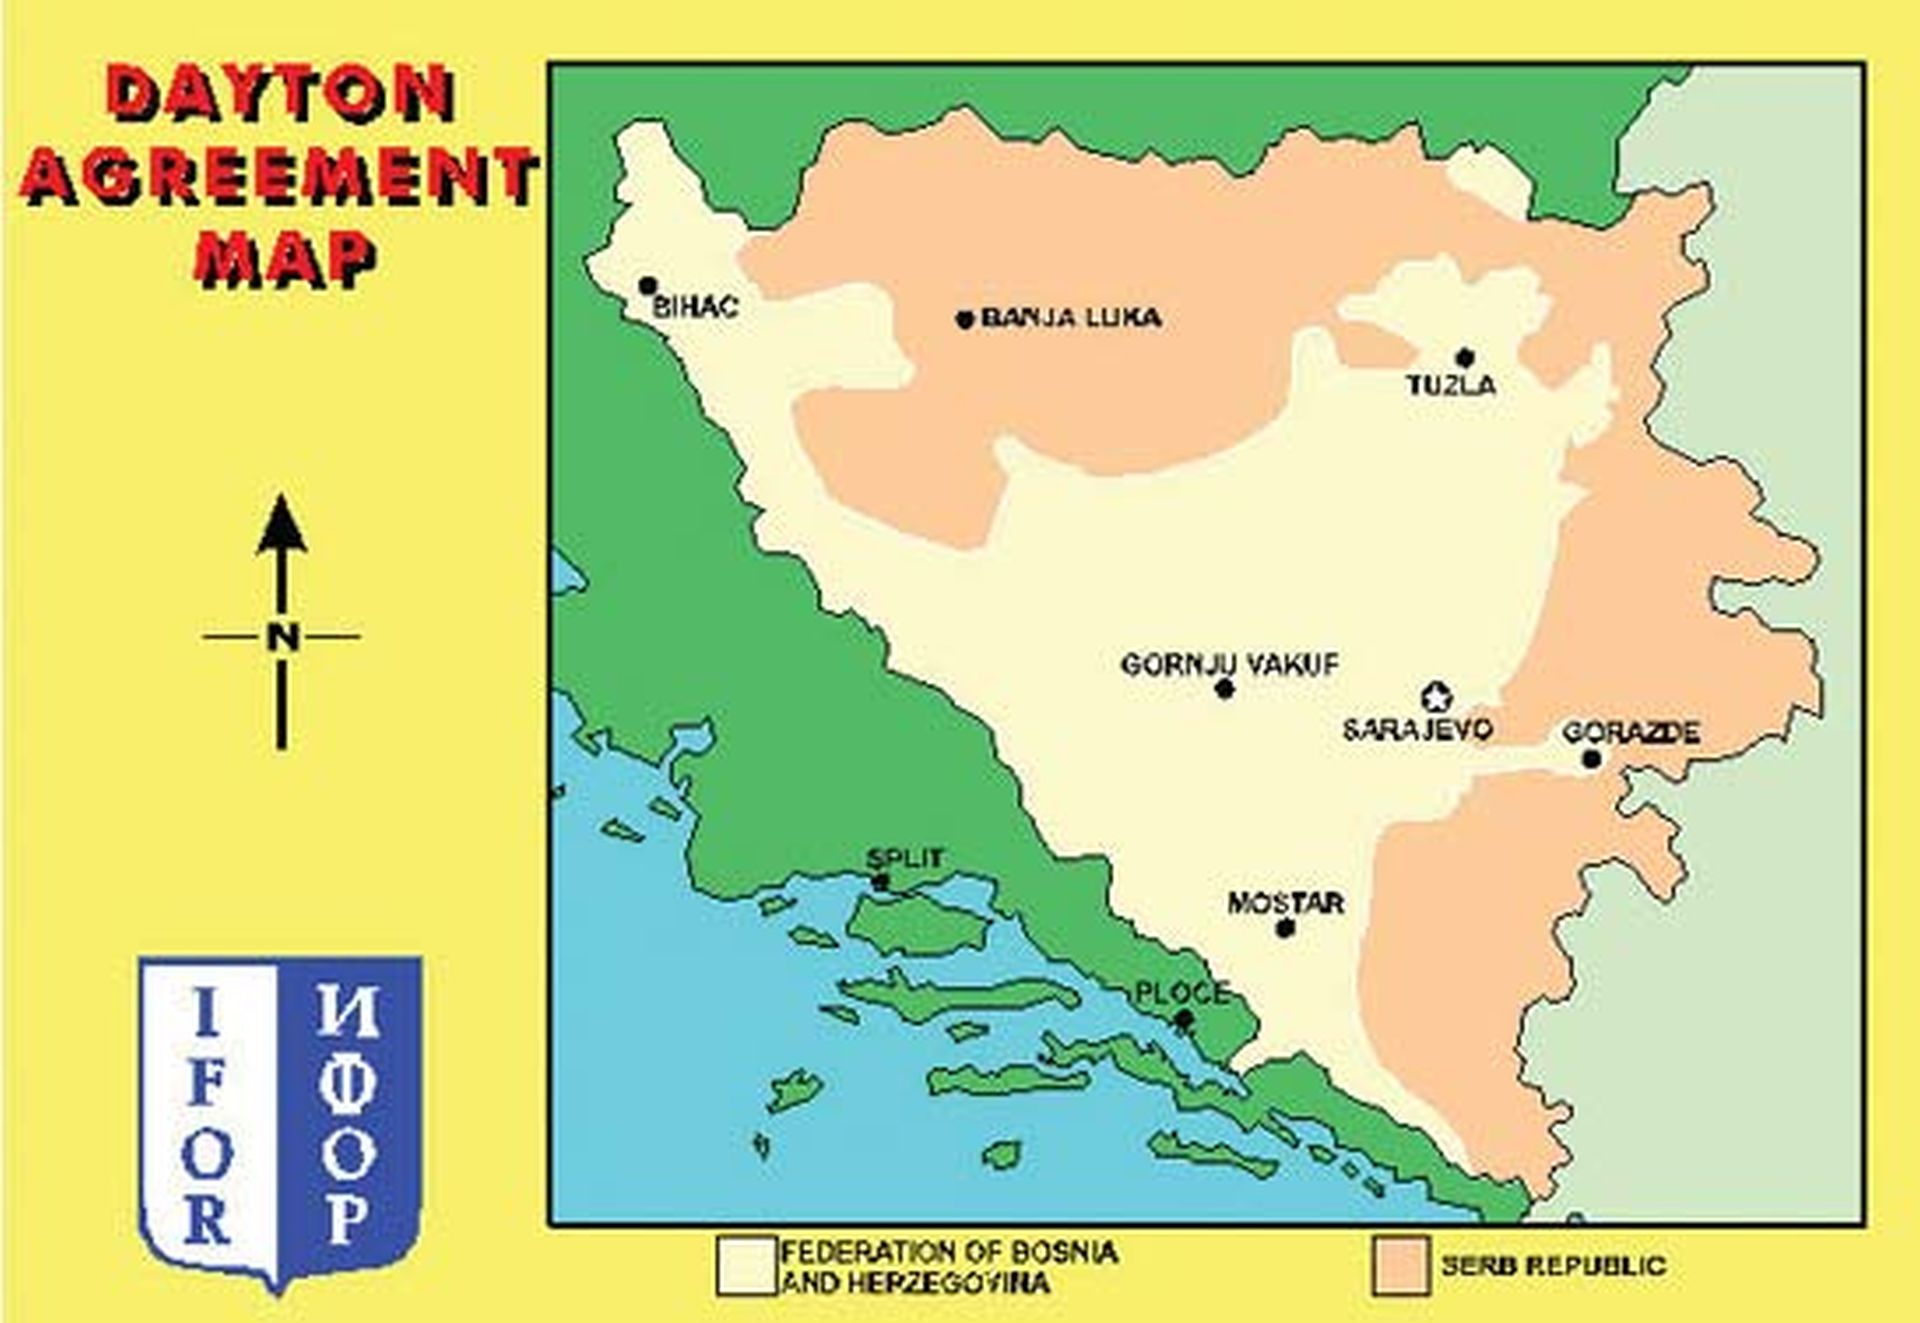 DOLIJAO PREPRODAVAČ BiH: Orginal Daytonskog sporazuma prodavao za 50.000 eura